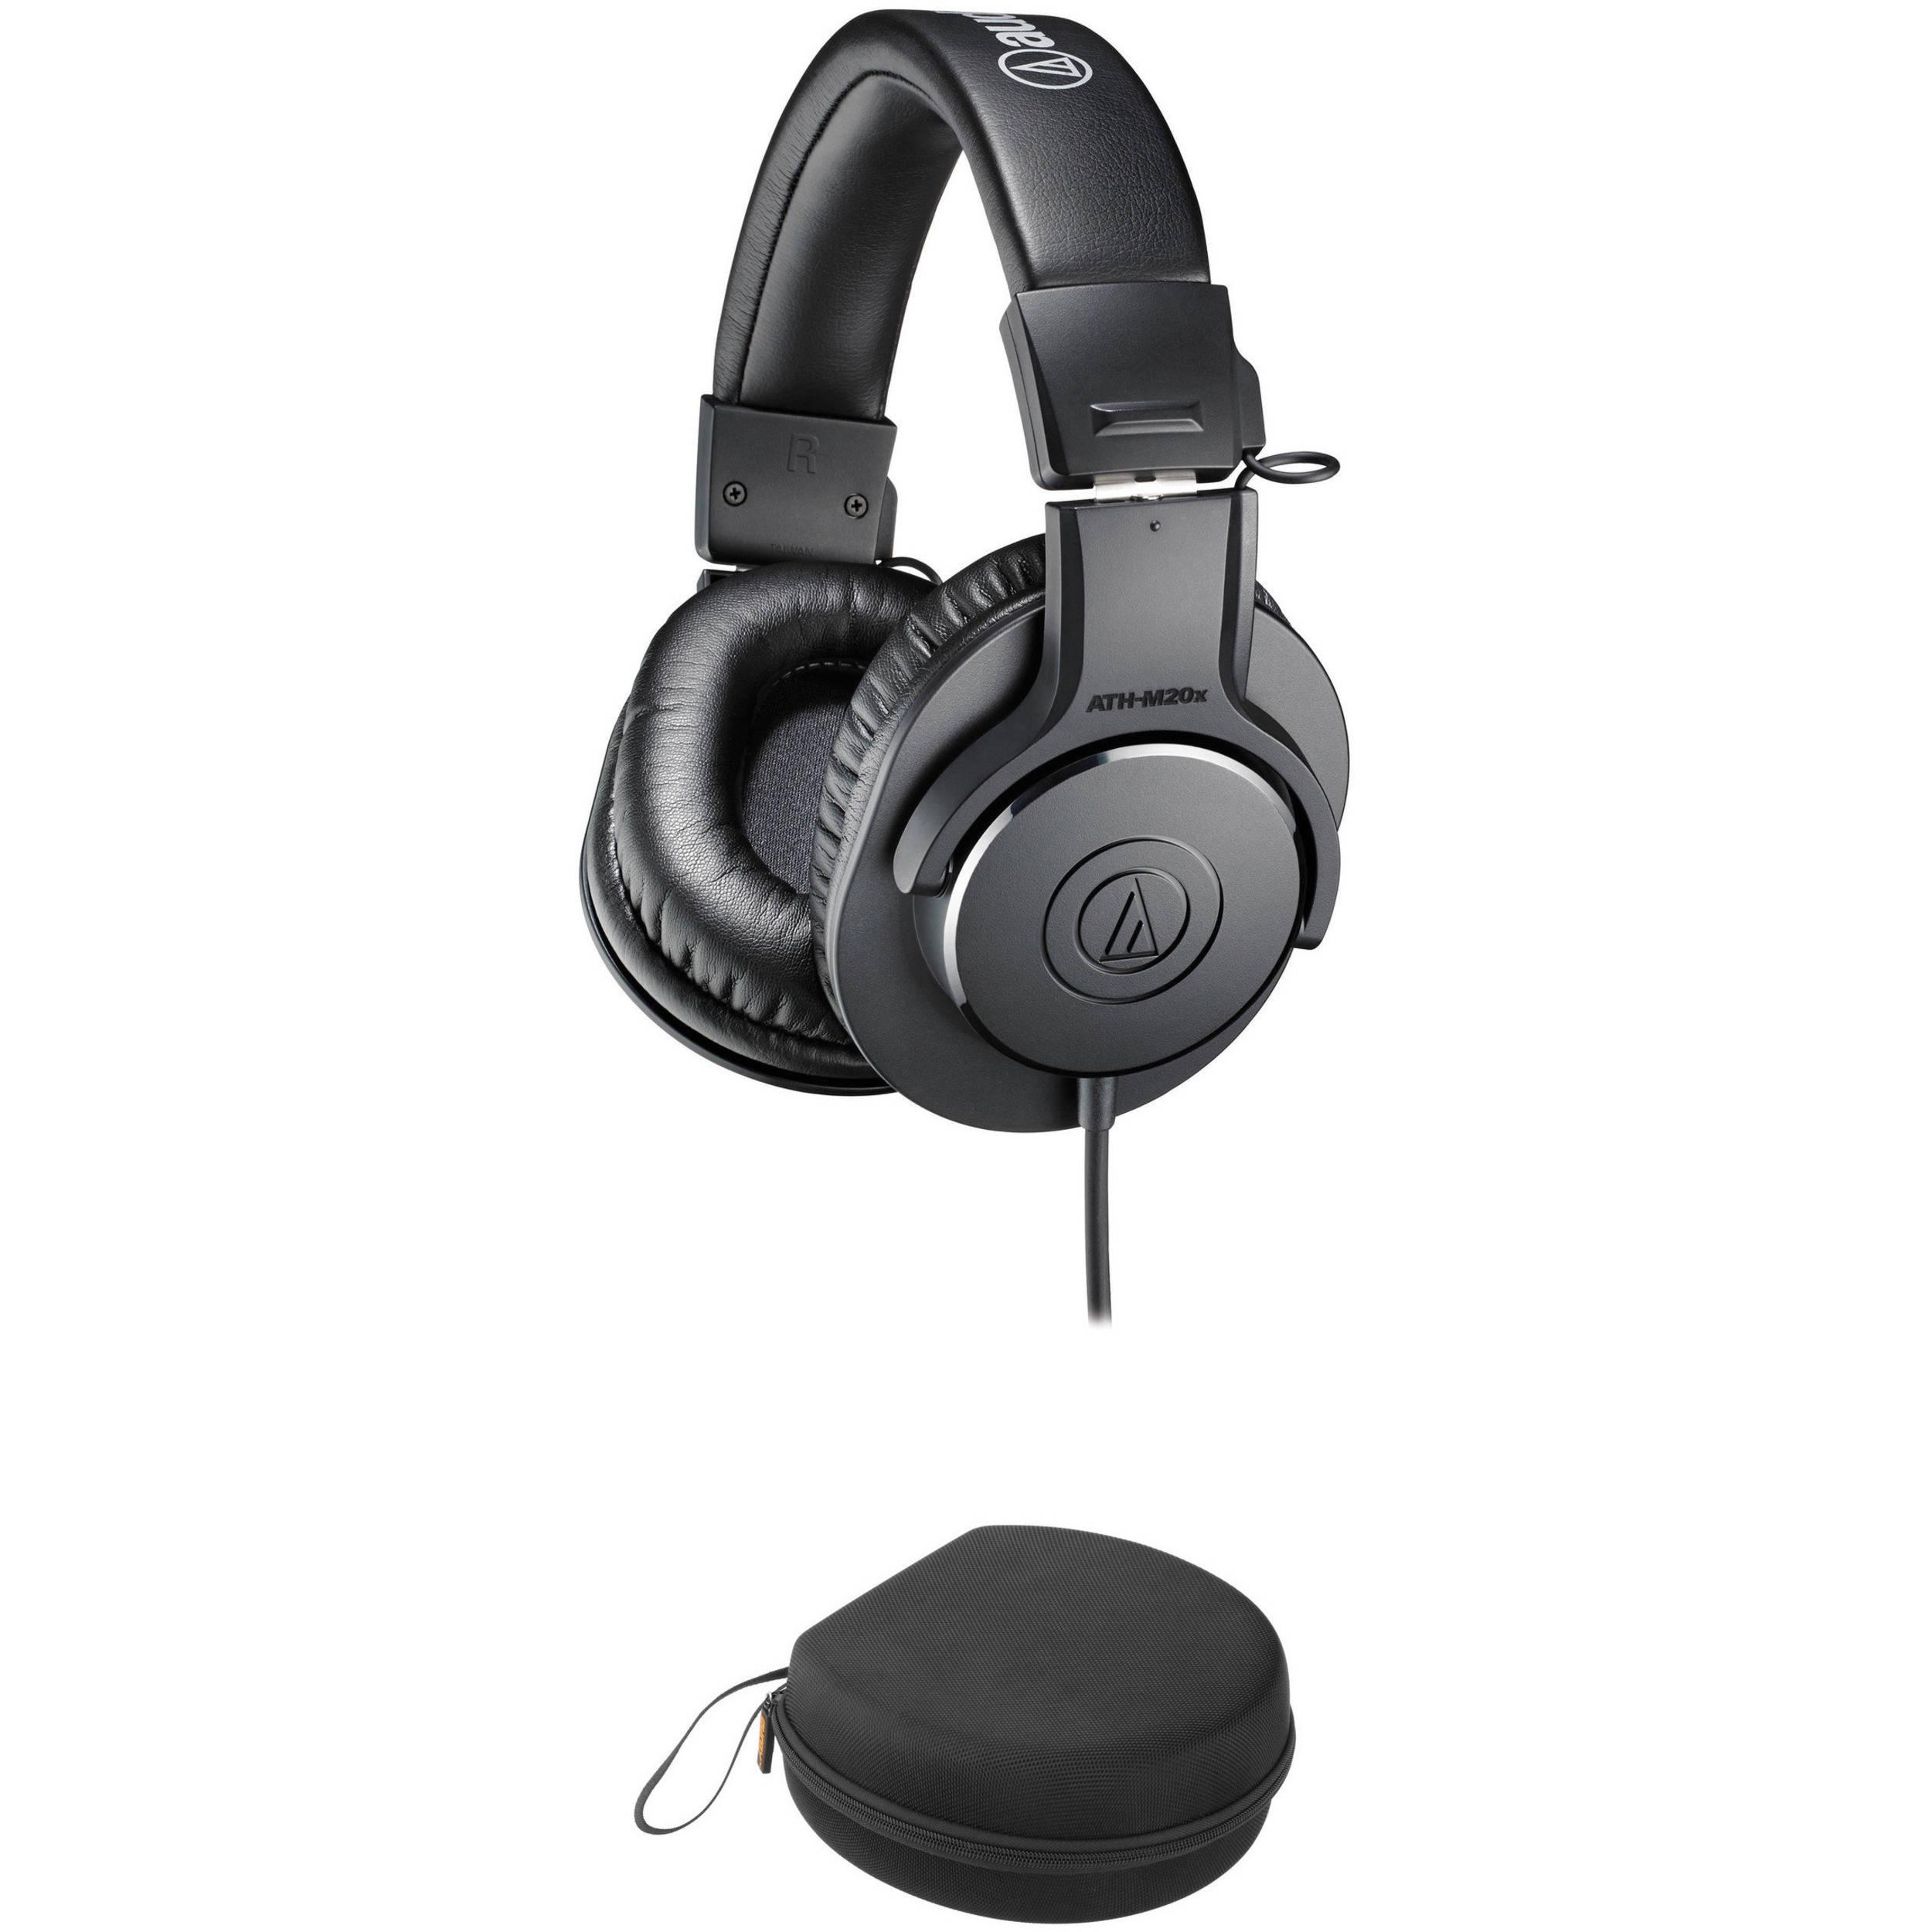 eb77c815513 Audio-Technica ATH-M20x Monitor Headphones (Black) ATH-M20X B&H